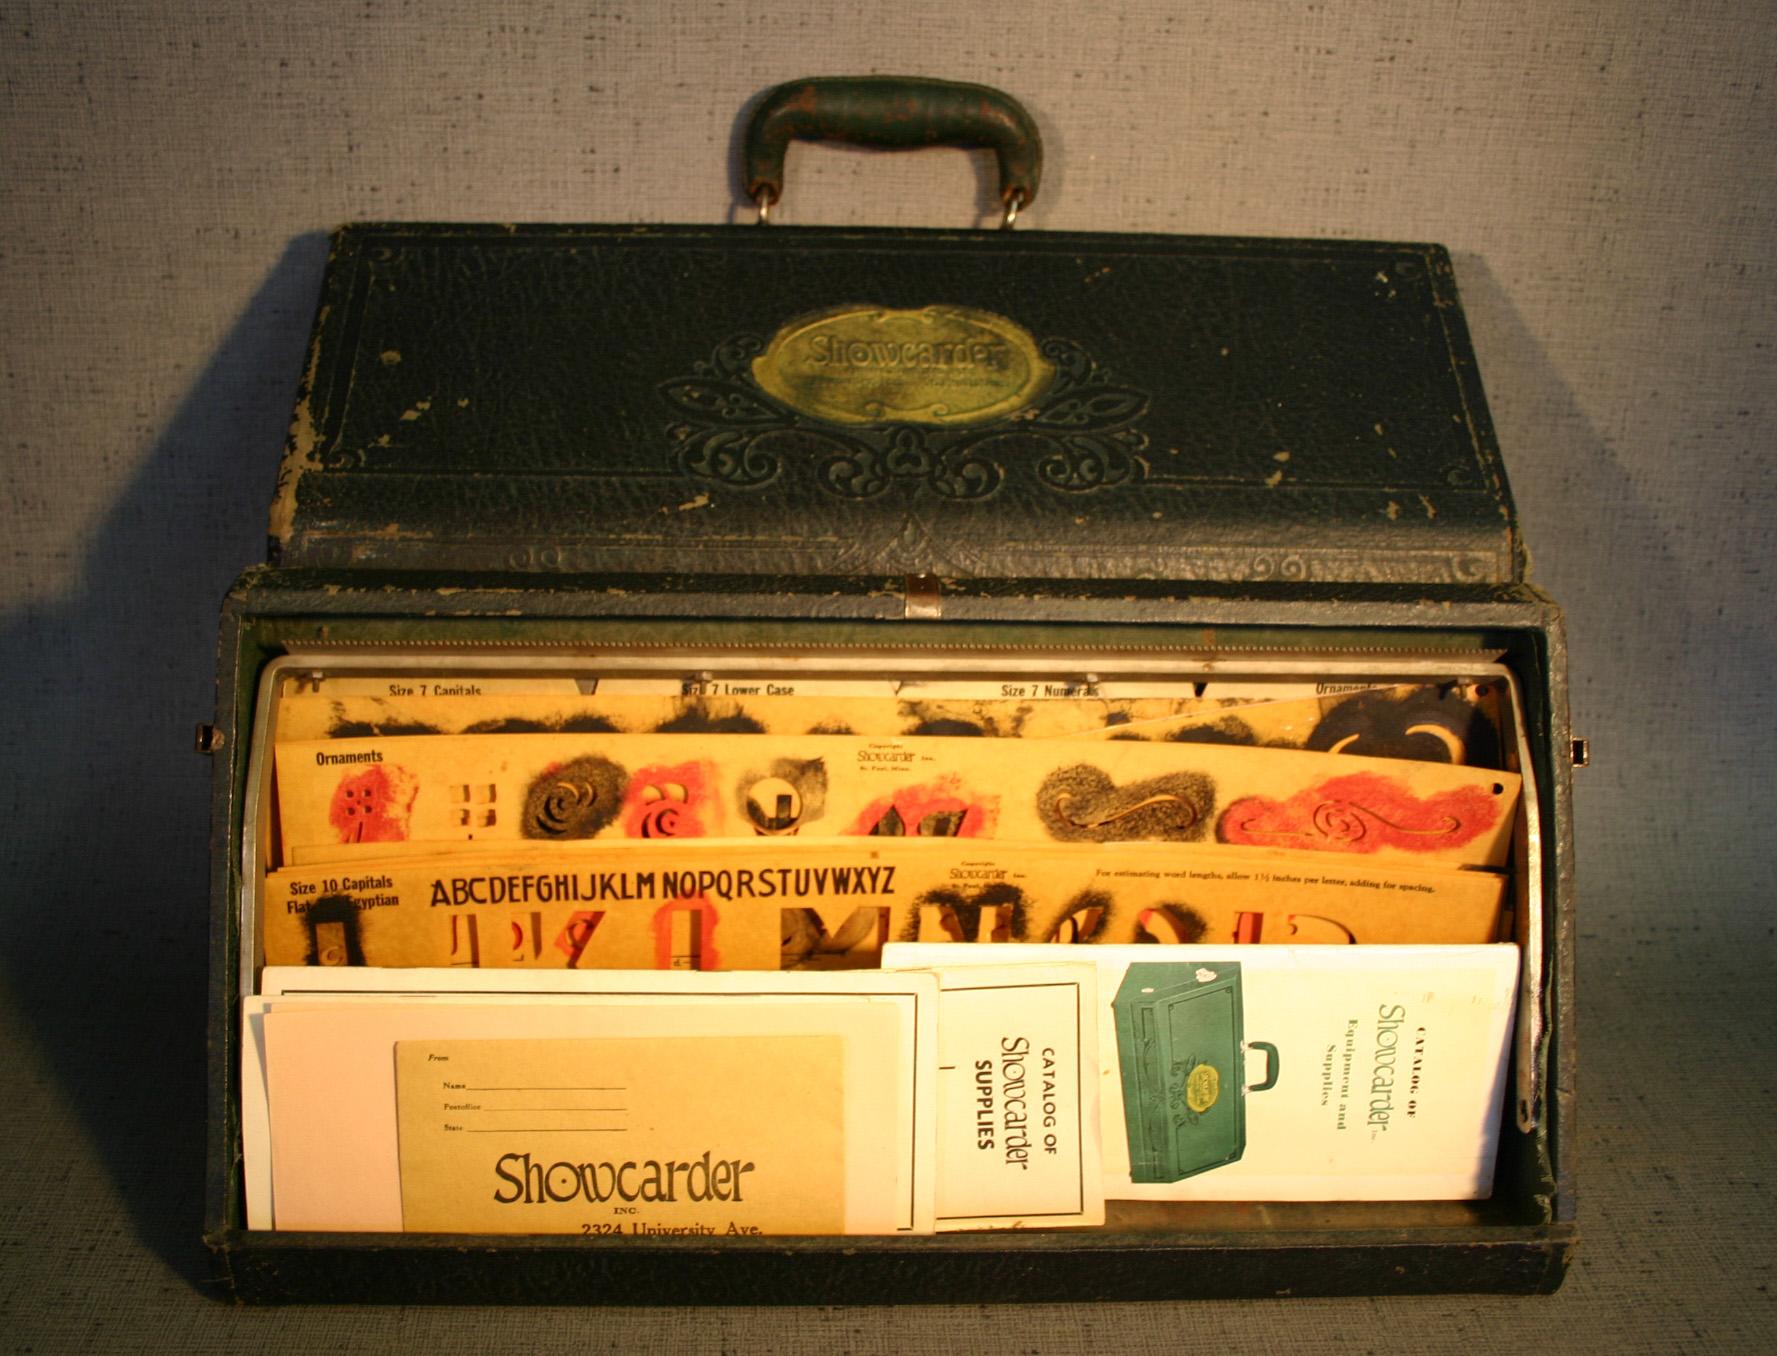 Professional Stenciler's Kit